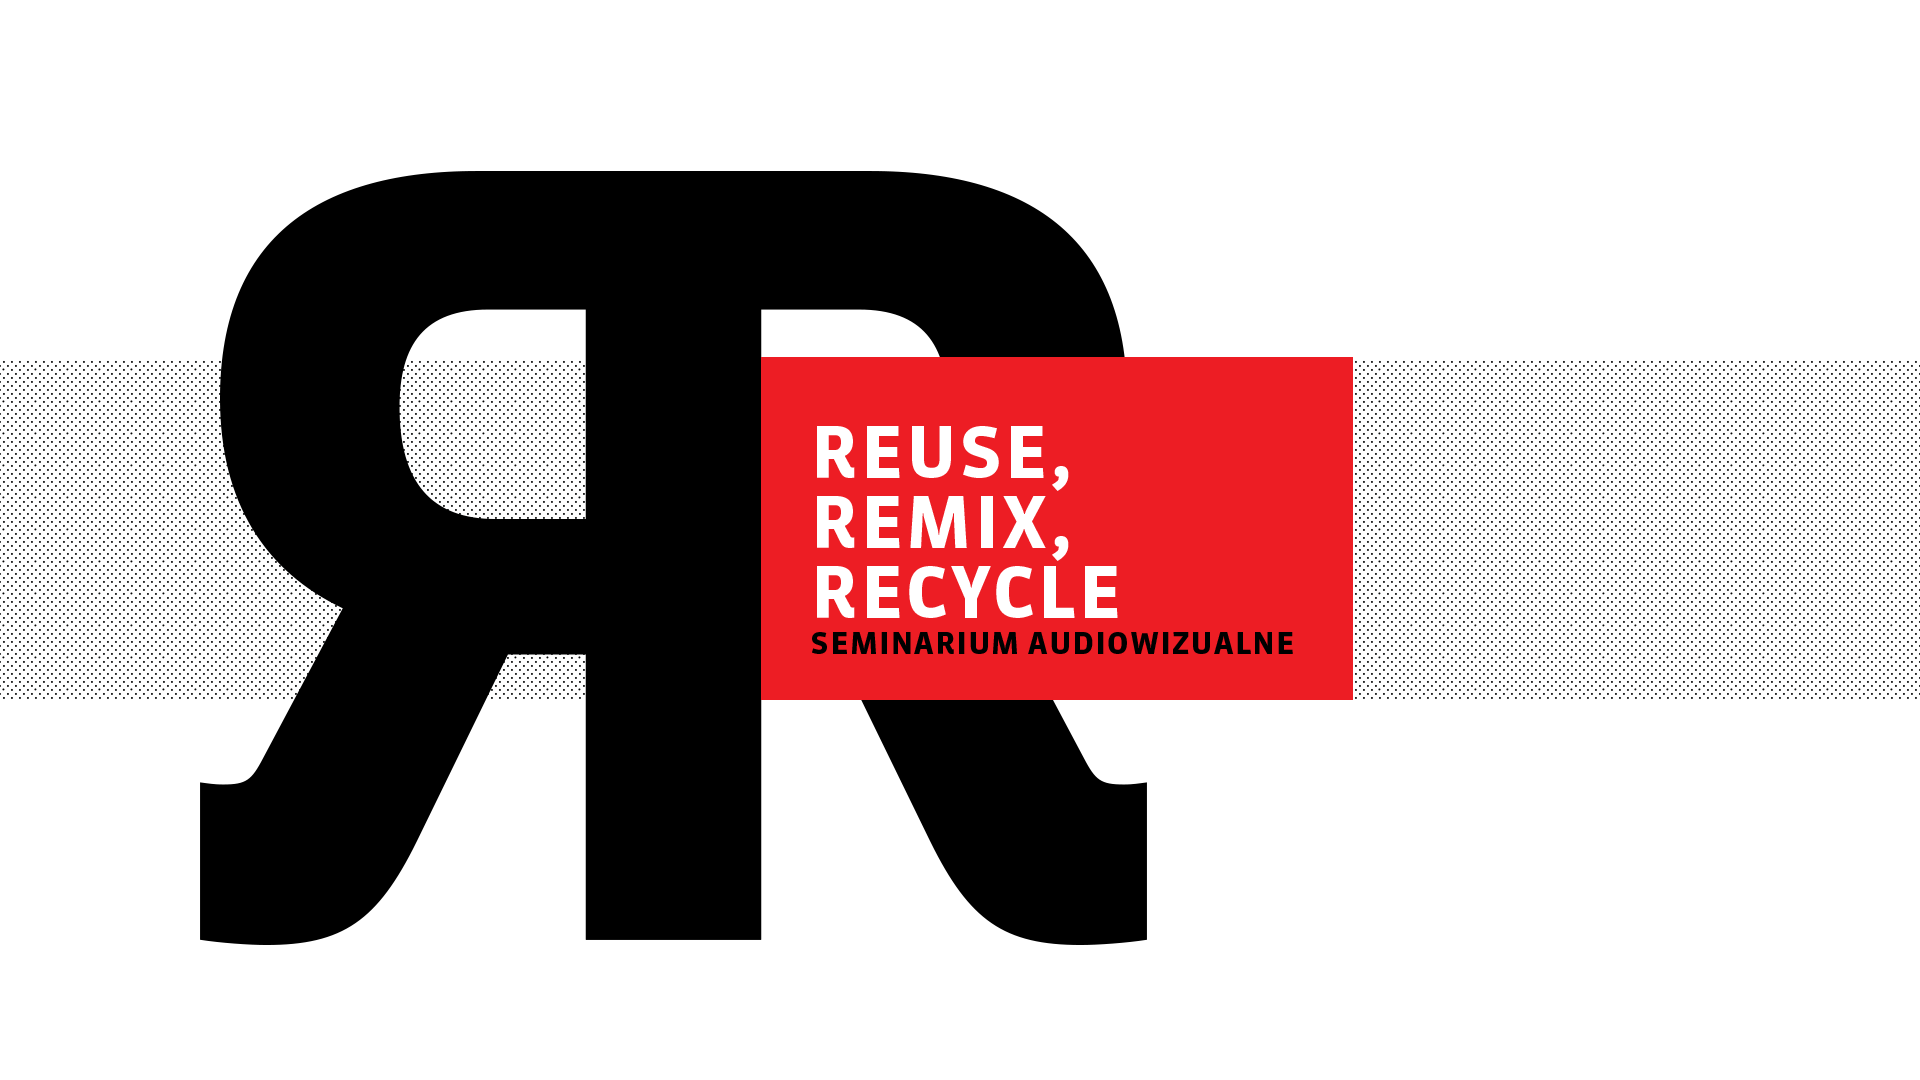 Reuse, remix, recycle | Seminarium Audiowizualne